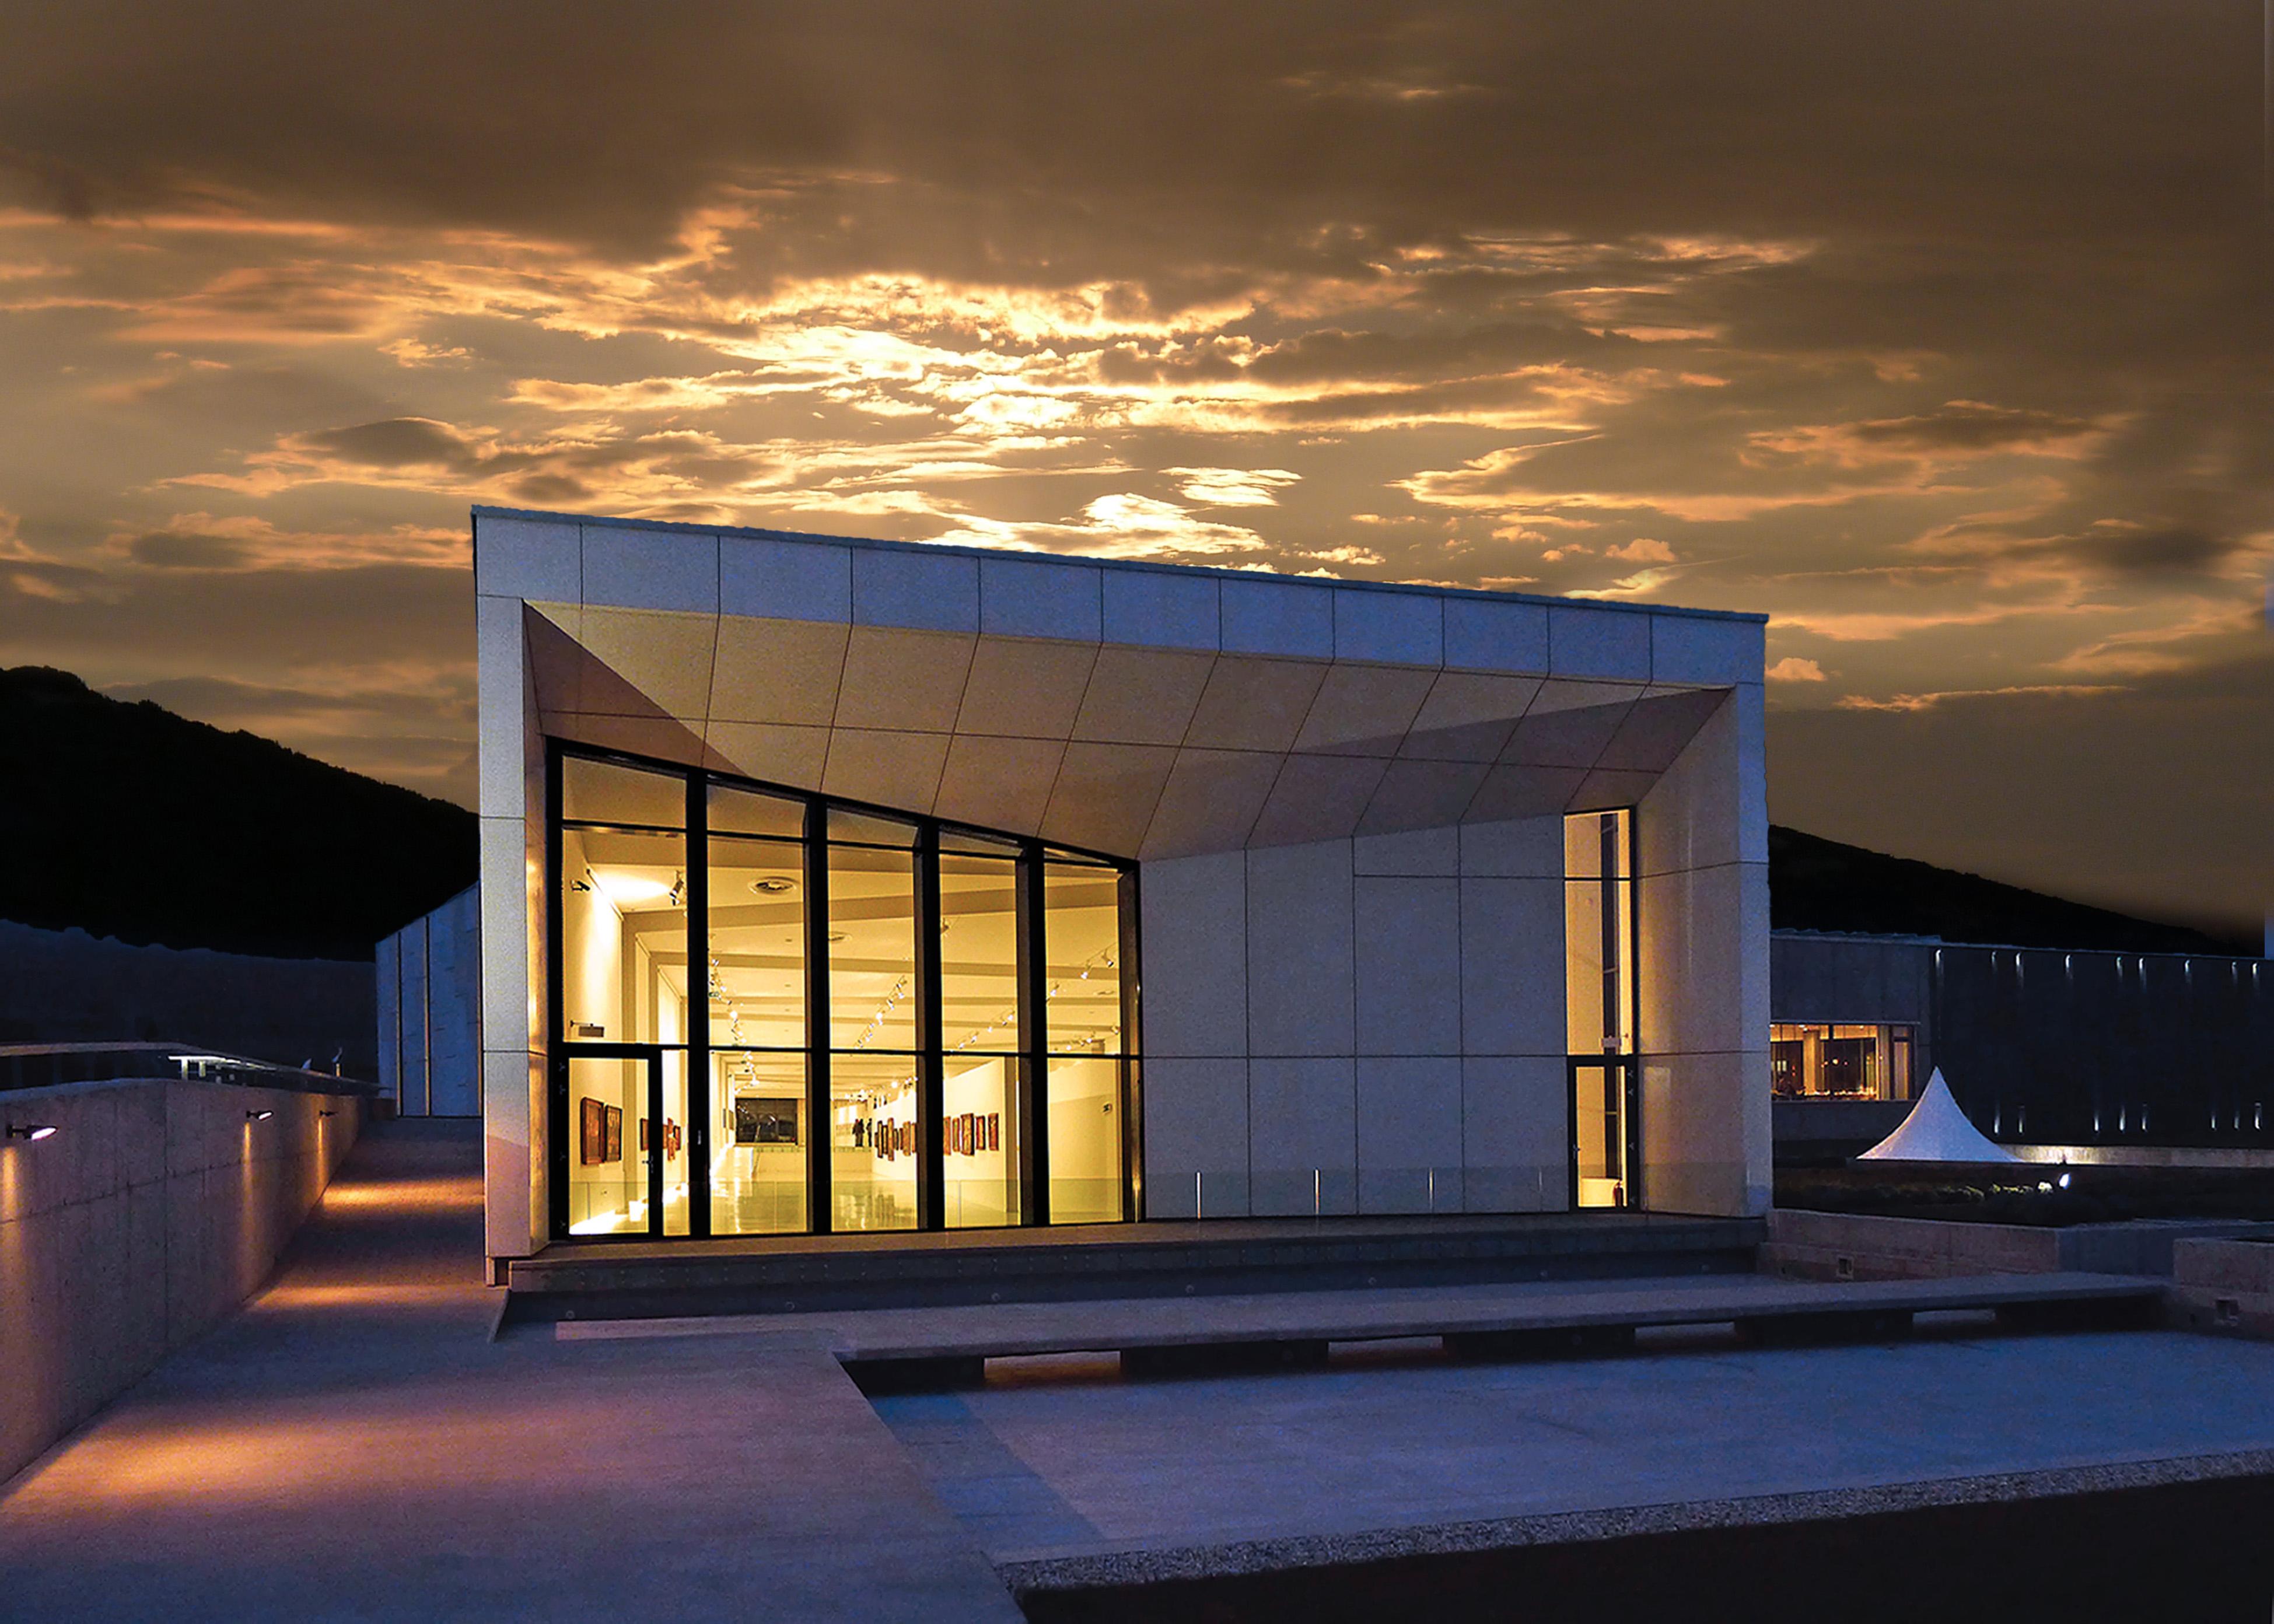 Elesko – Zoya Museum